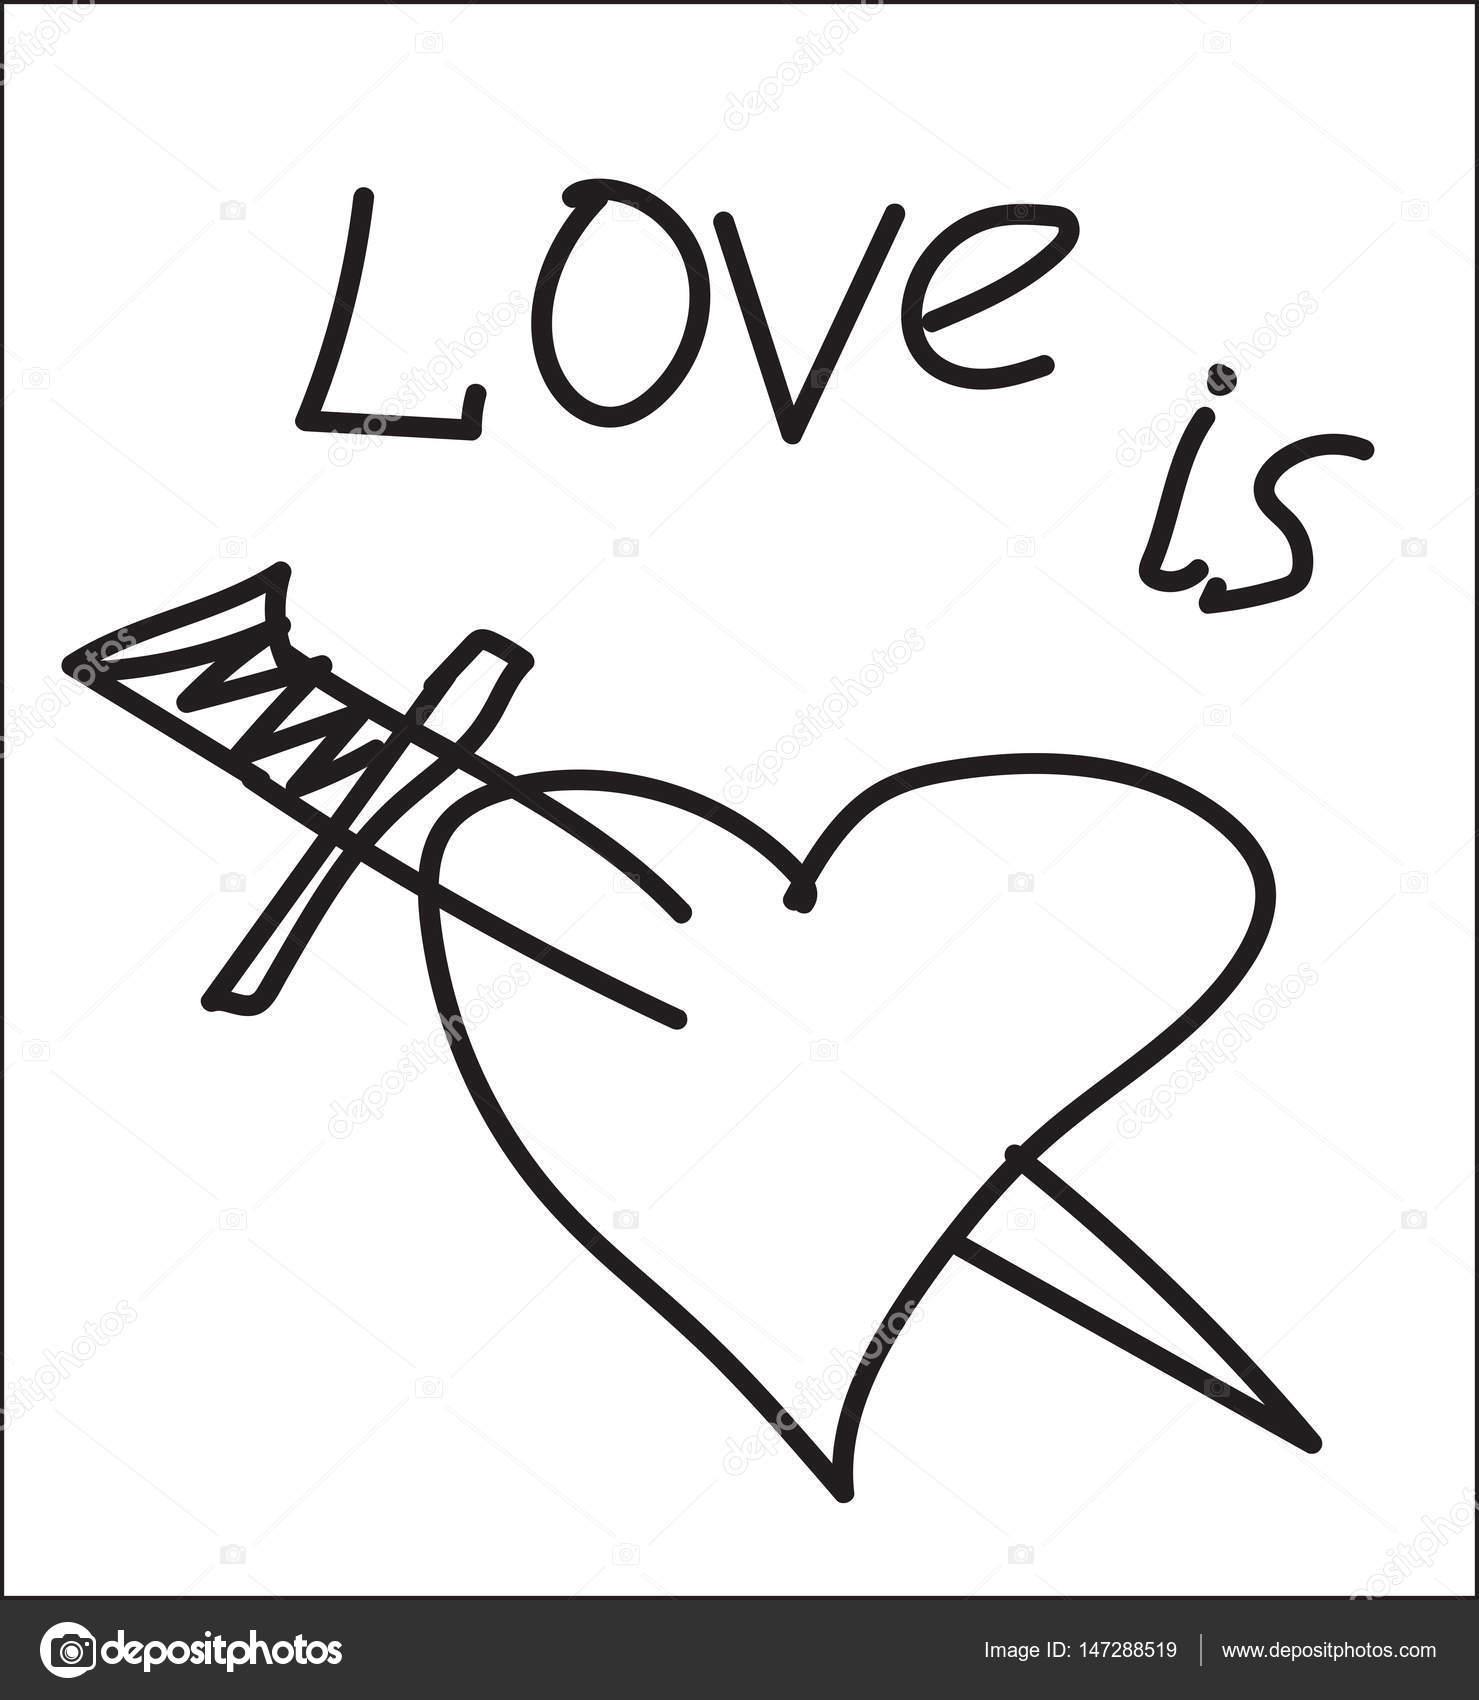 Love is heart knife betrayal stock photo bumble dee 147288519 love is heart knife betrayal stock photo biocorpaavc